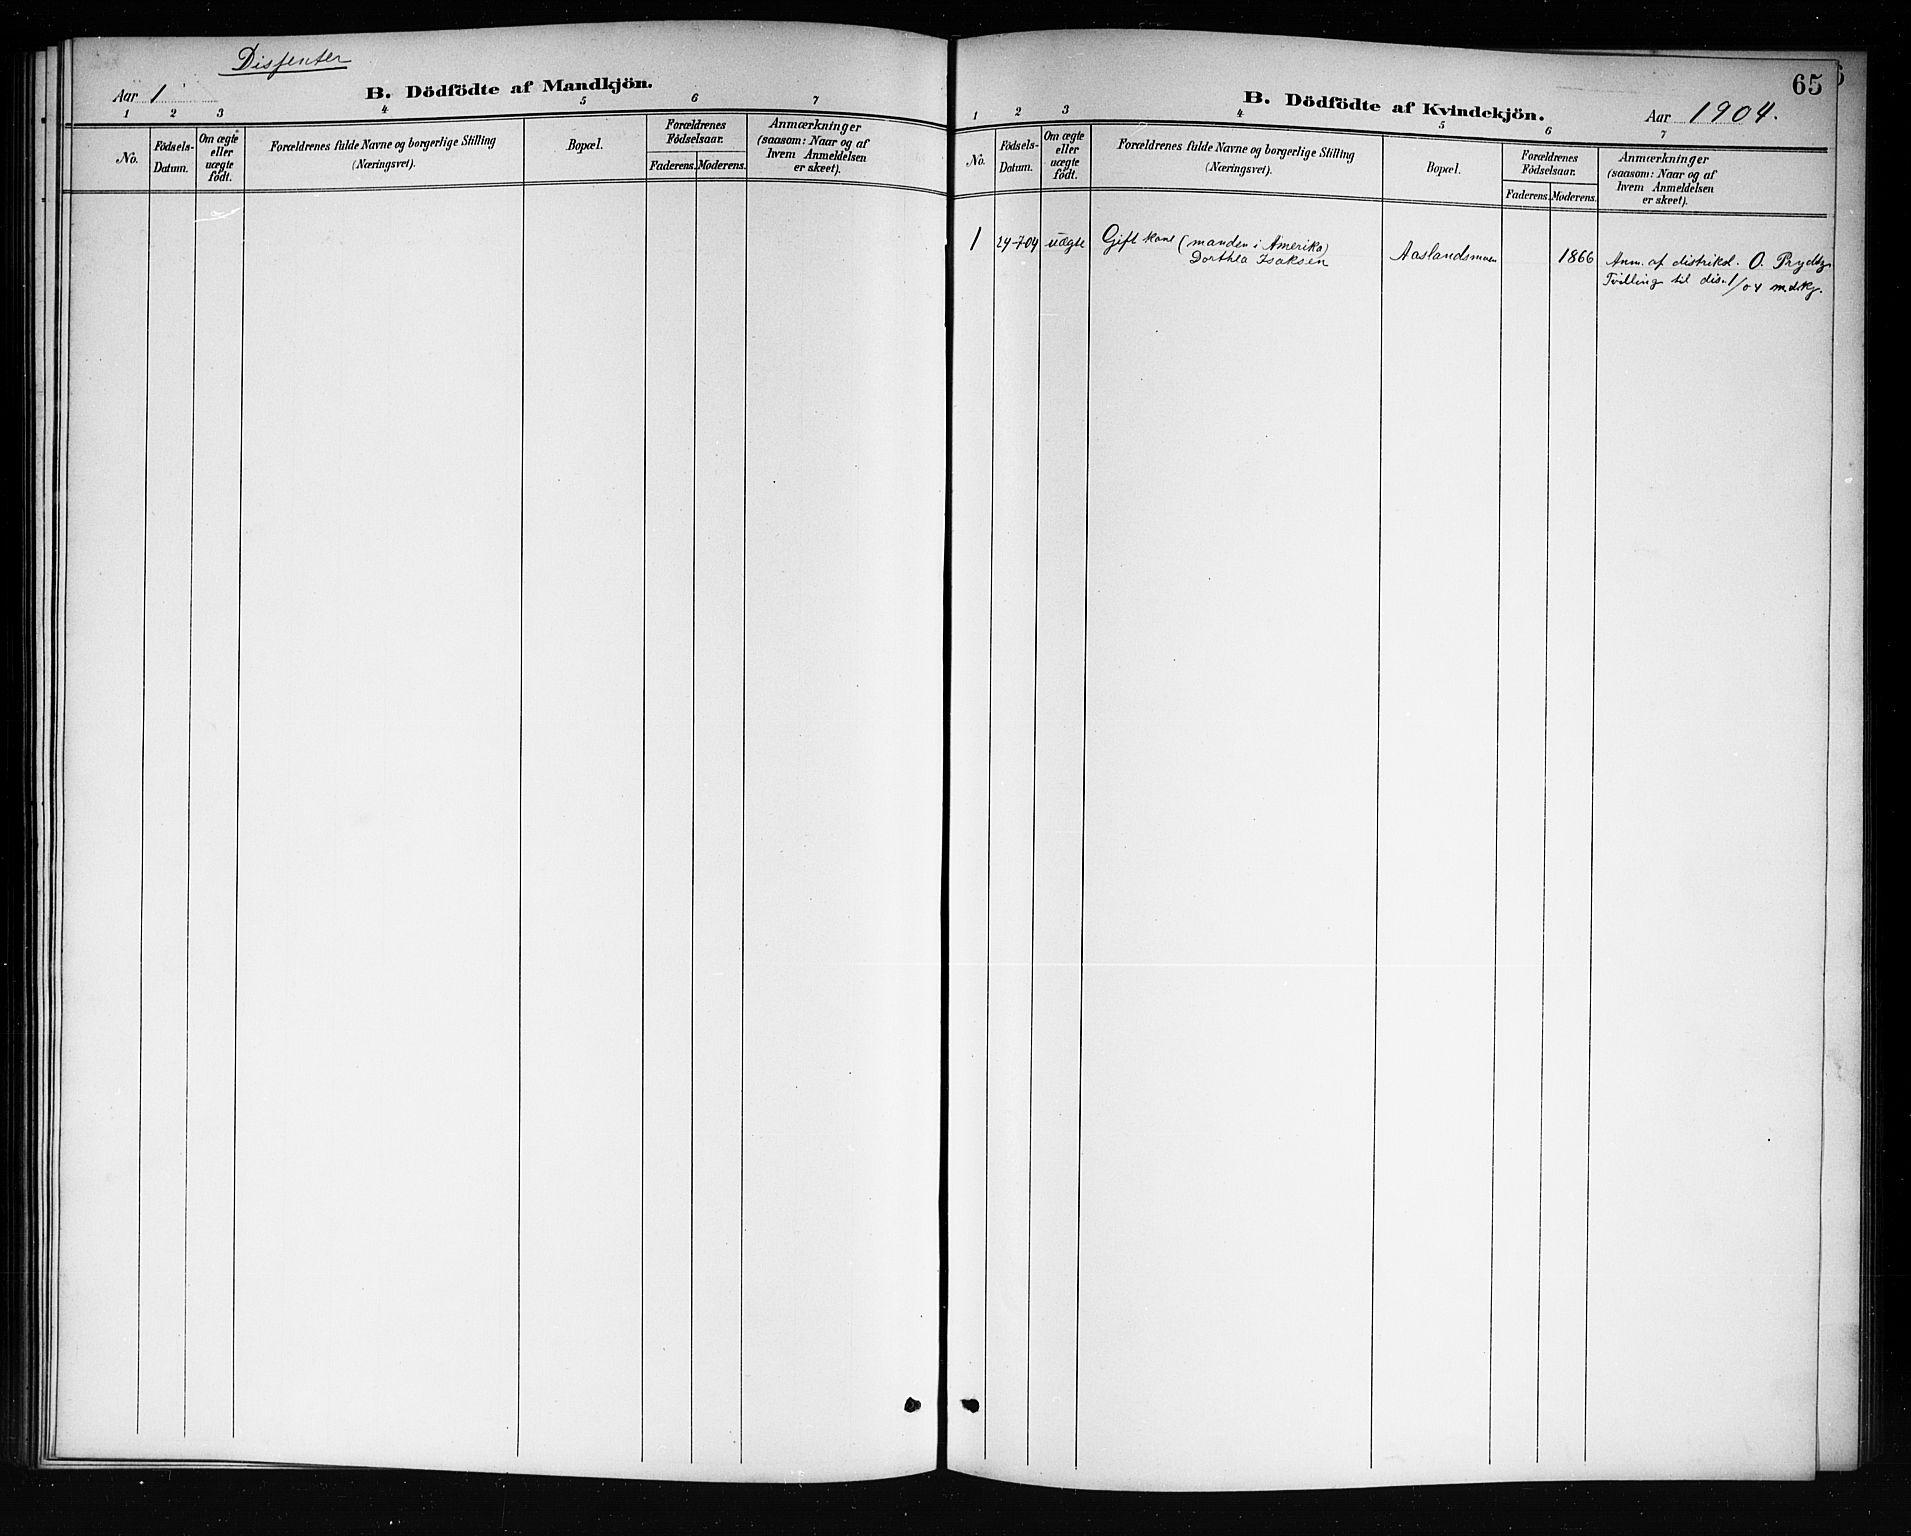 SAKO, Mo kirkebøker, G/Ga/L0002: Klokkerbok nr. I 2, 1892-1914, s. 65